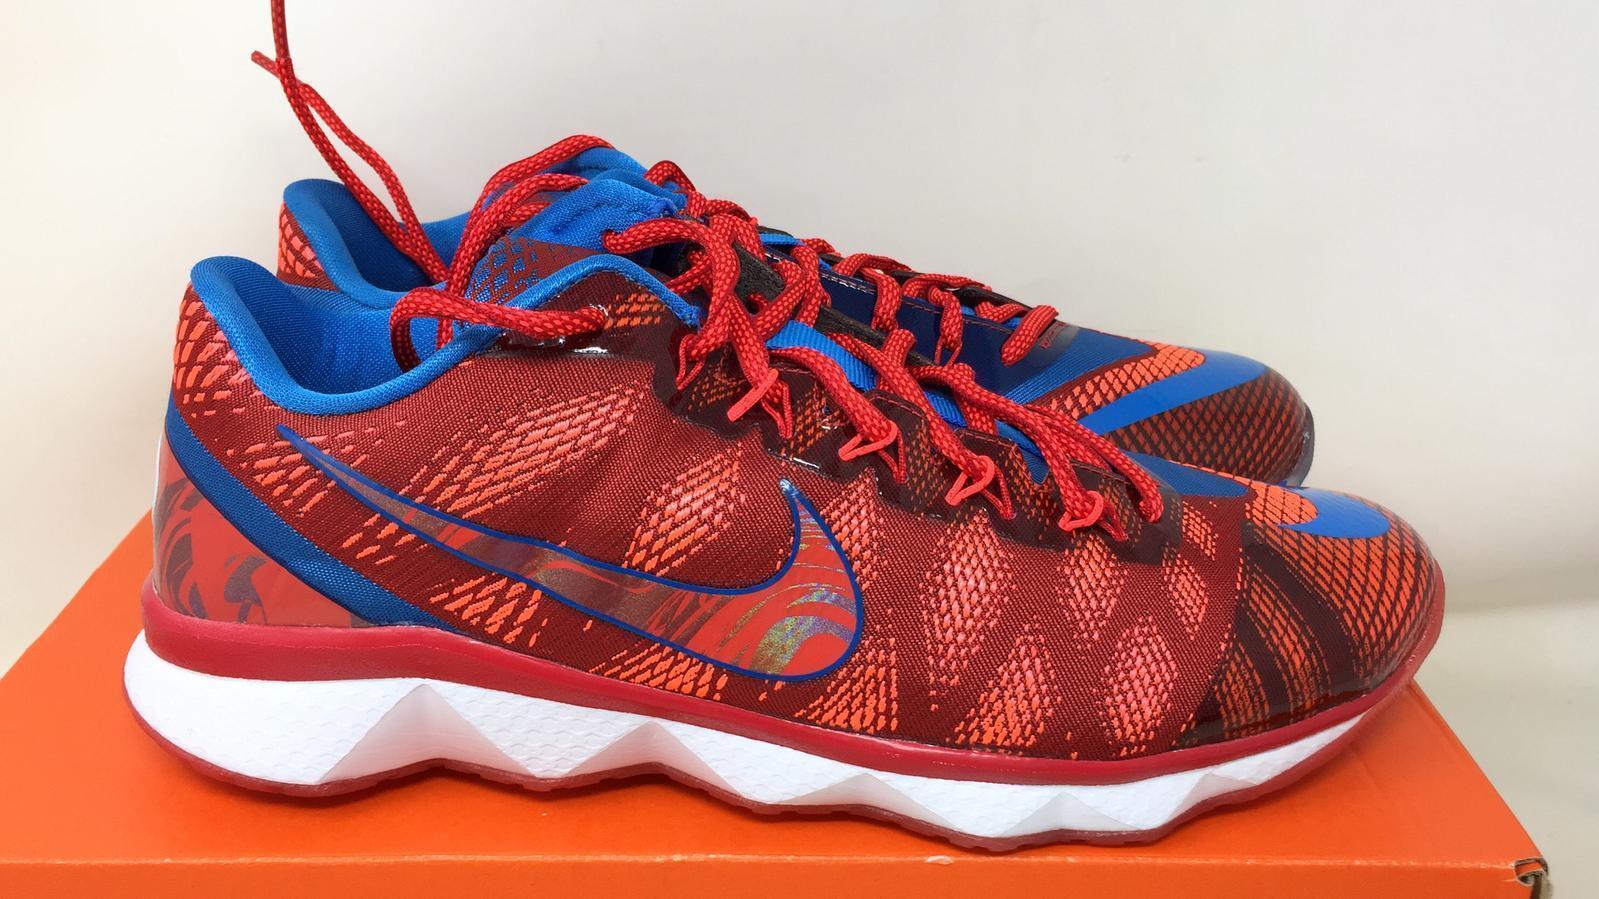 Men's Nike NEW Cj3 Training NIB 8.5 size shoes Edition